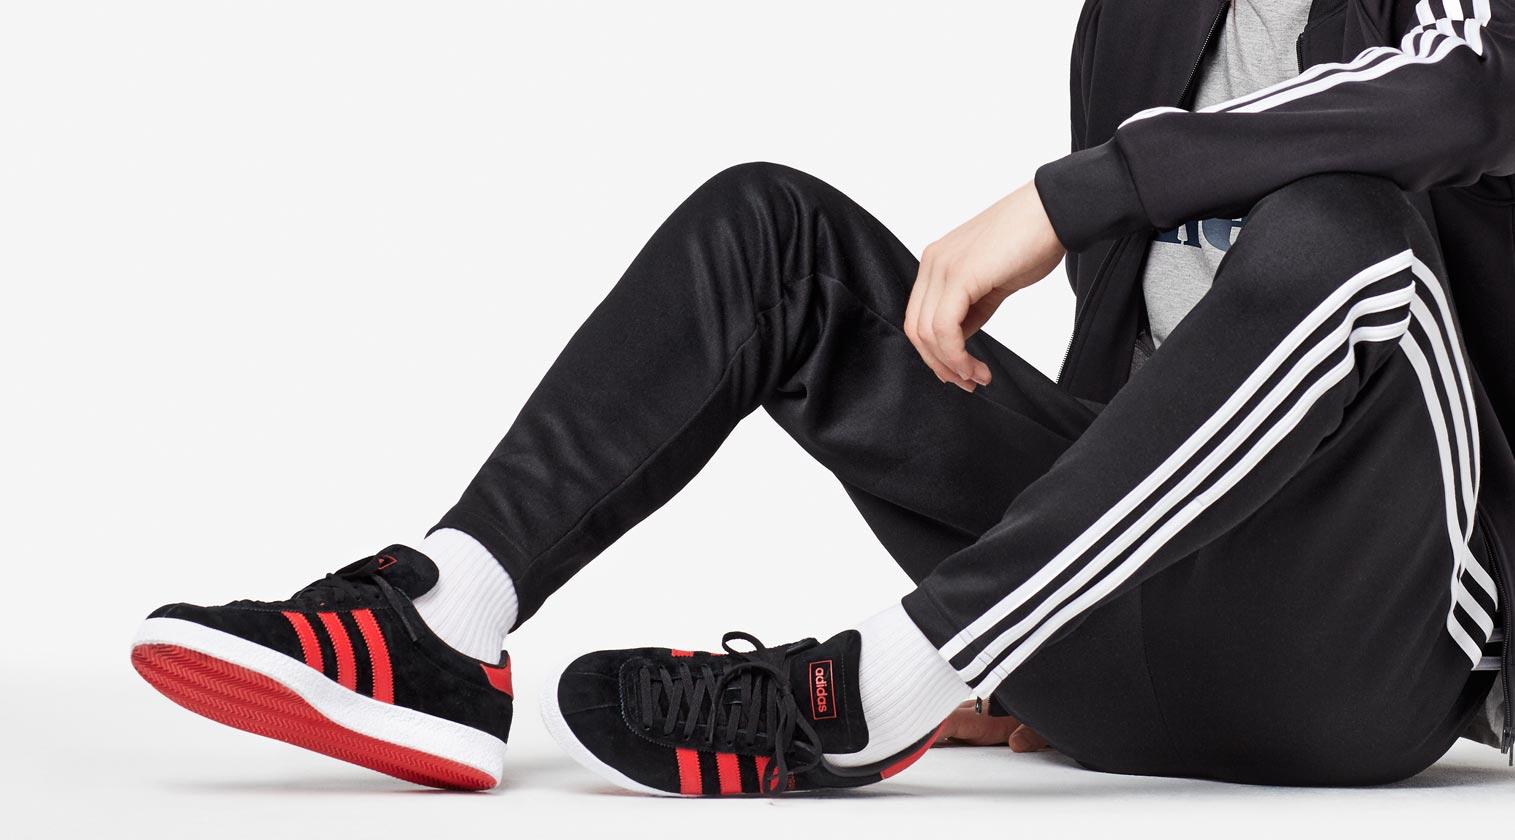 Scarpe Nike Uomo Zalando capeland.it